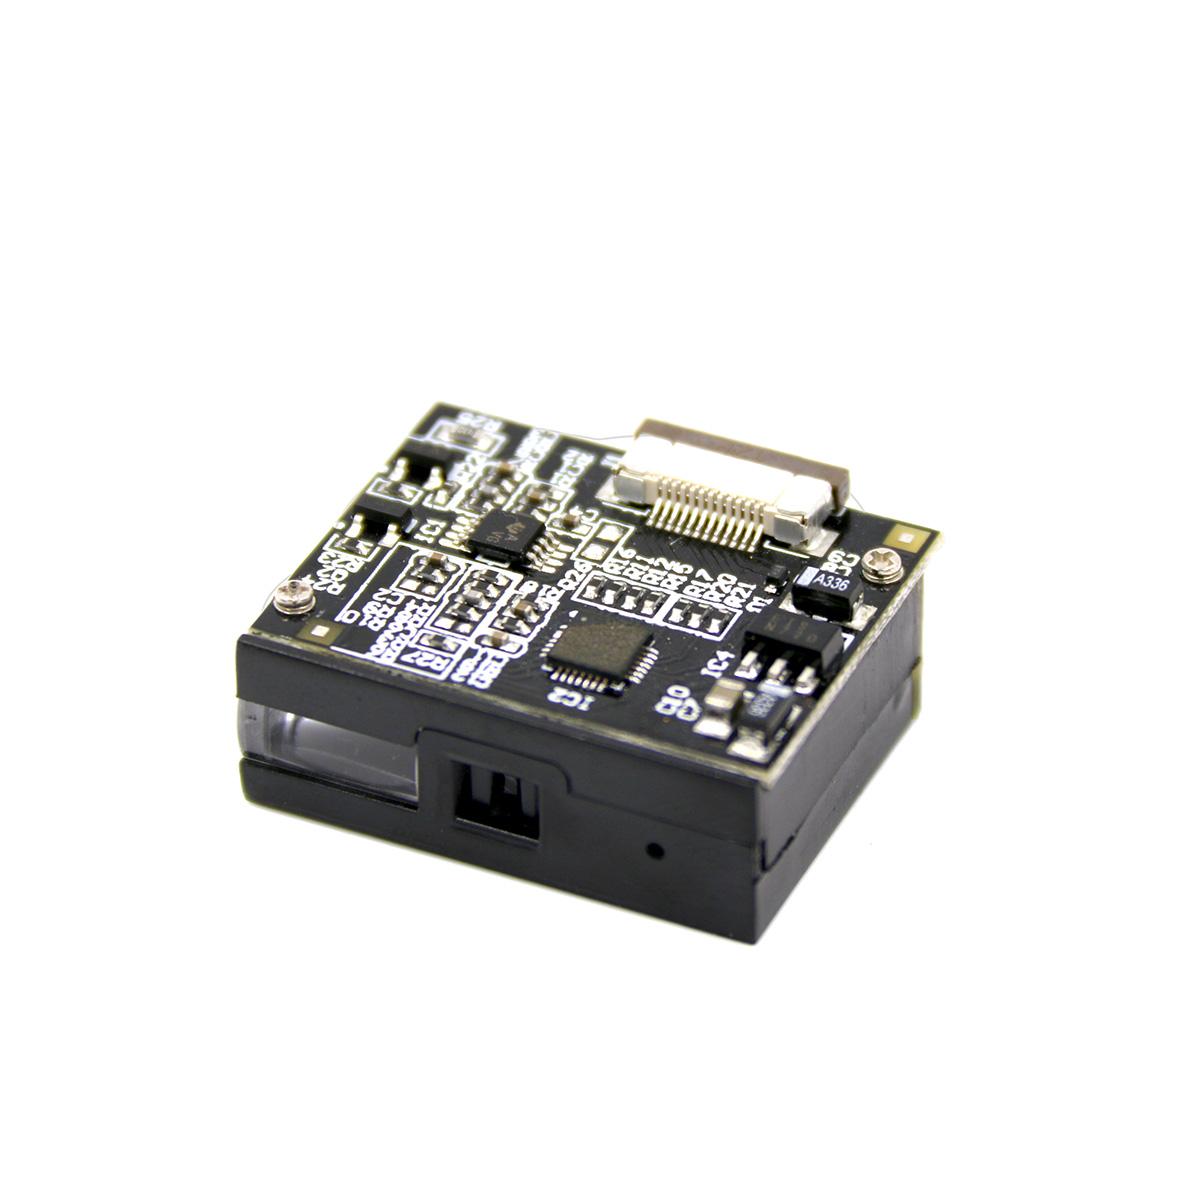 VM1300 一维嵌入式红光条码扫码模组 手机屏幕条形码扫描模块引擎